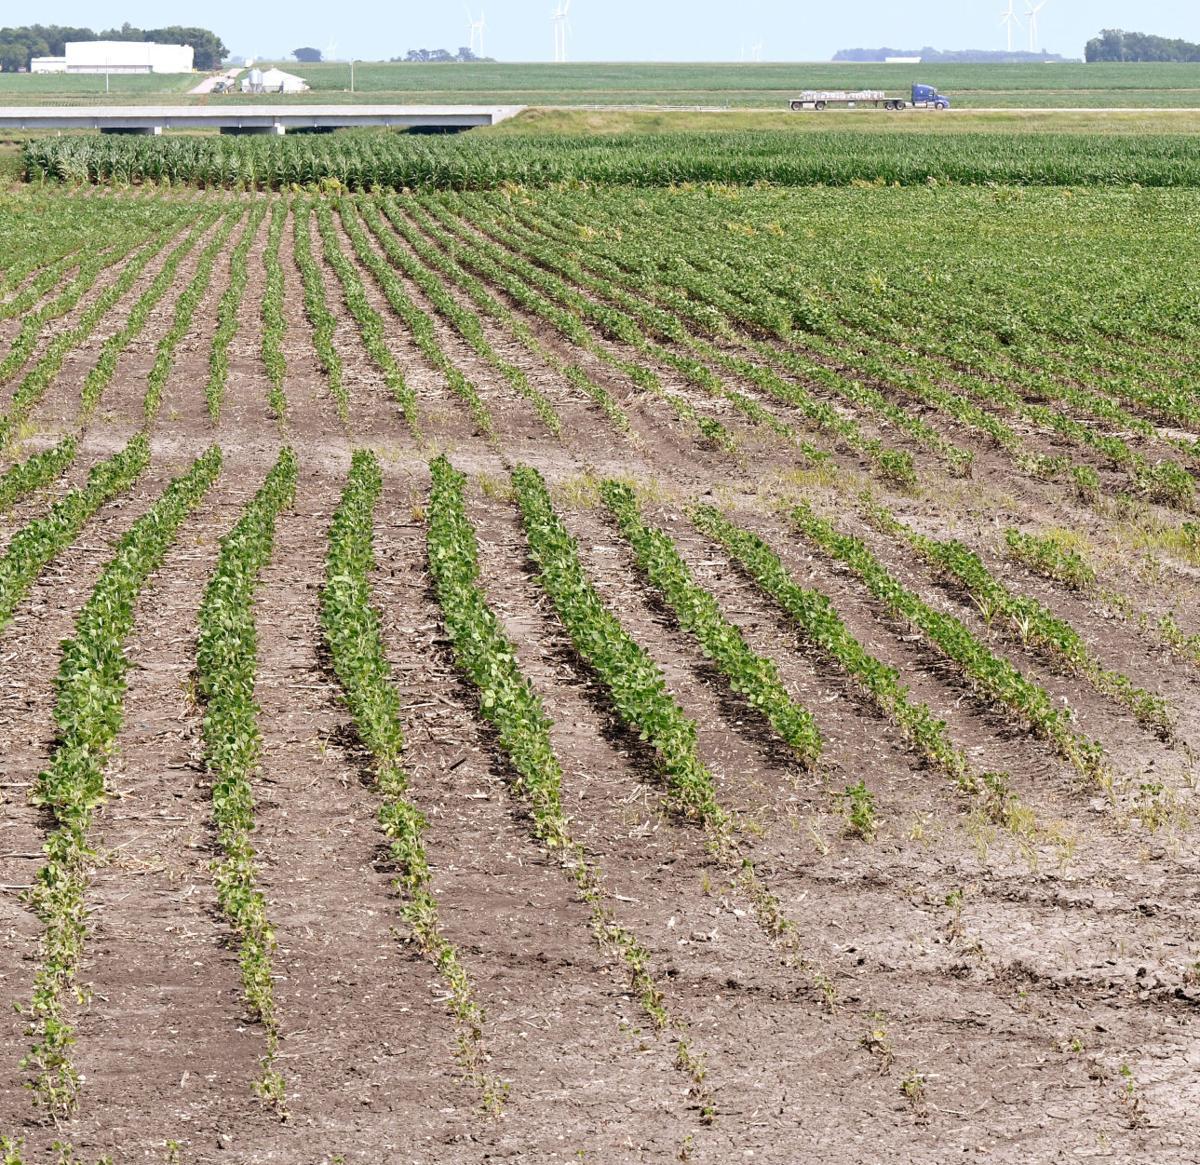 Soybean field north of Sheldon